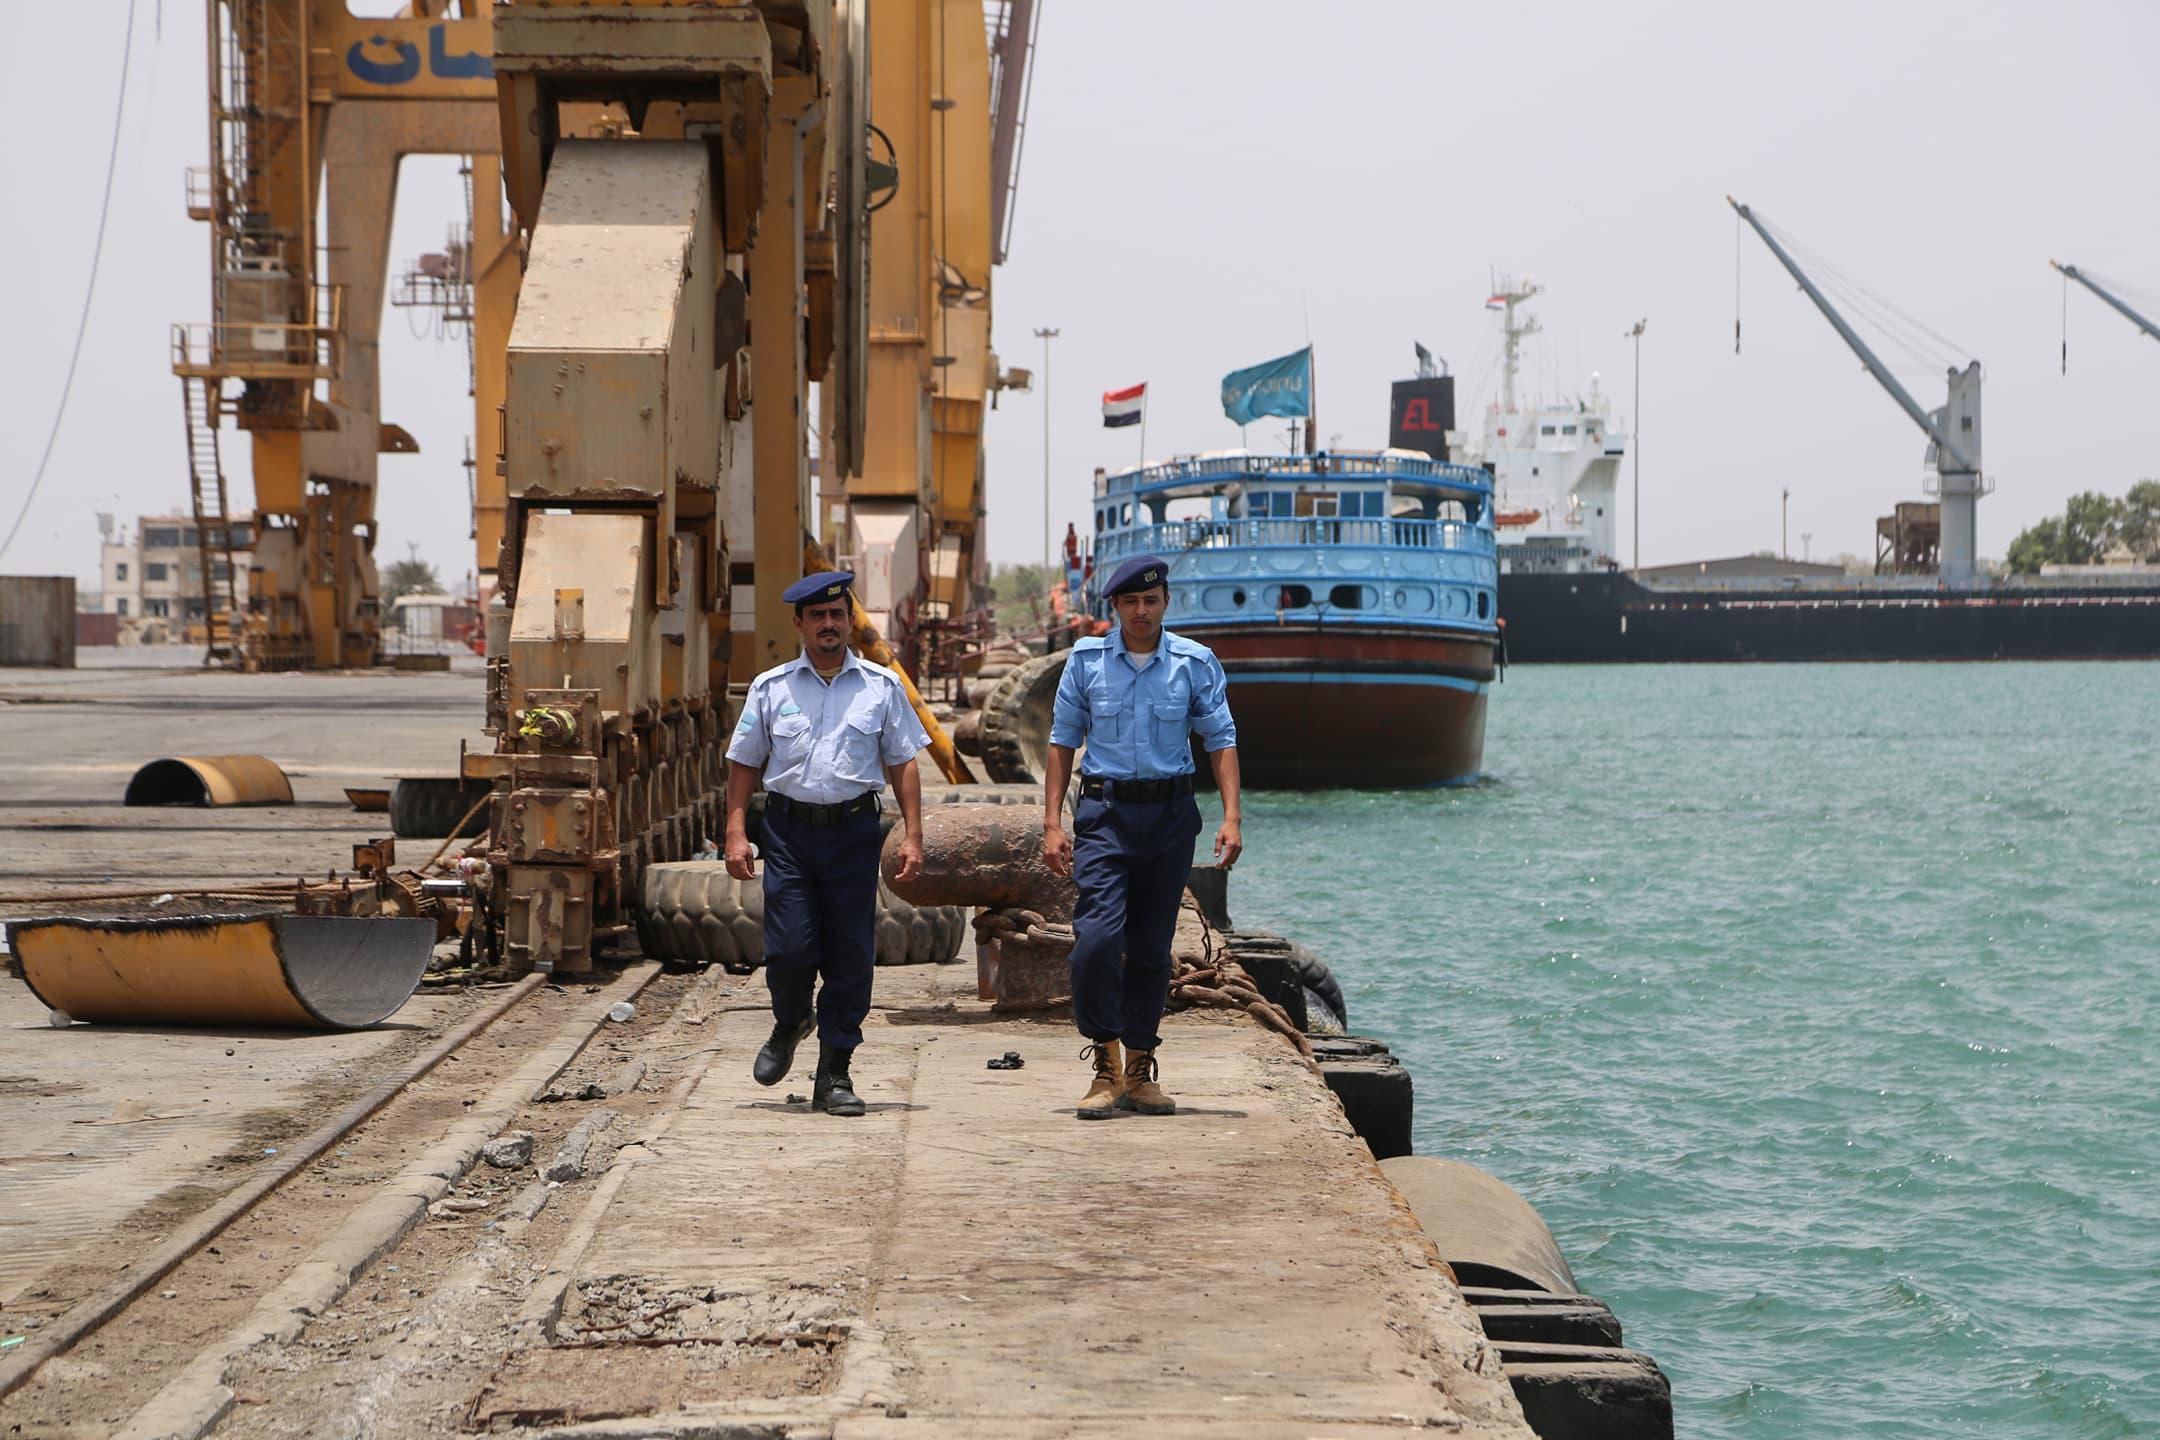 Oil tanker near Yemen coast could soon explode, experts warn